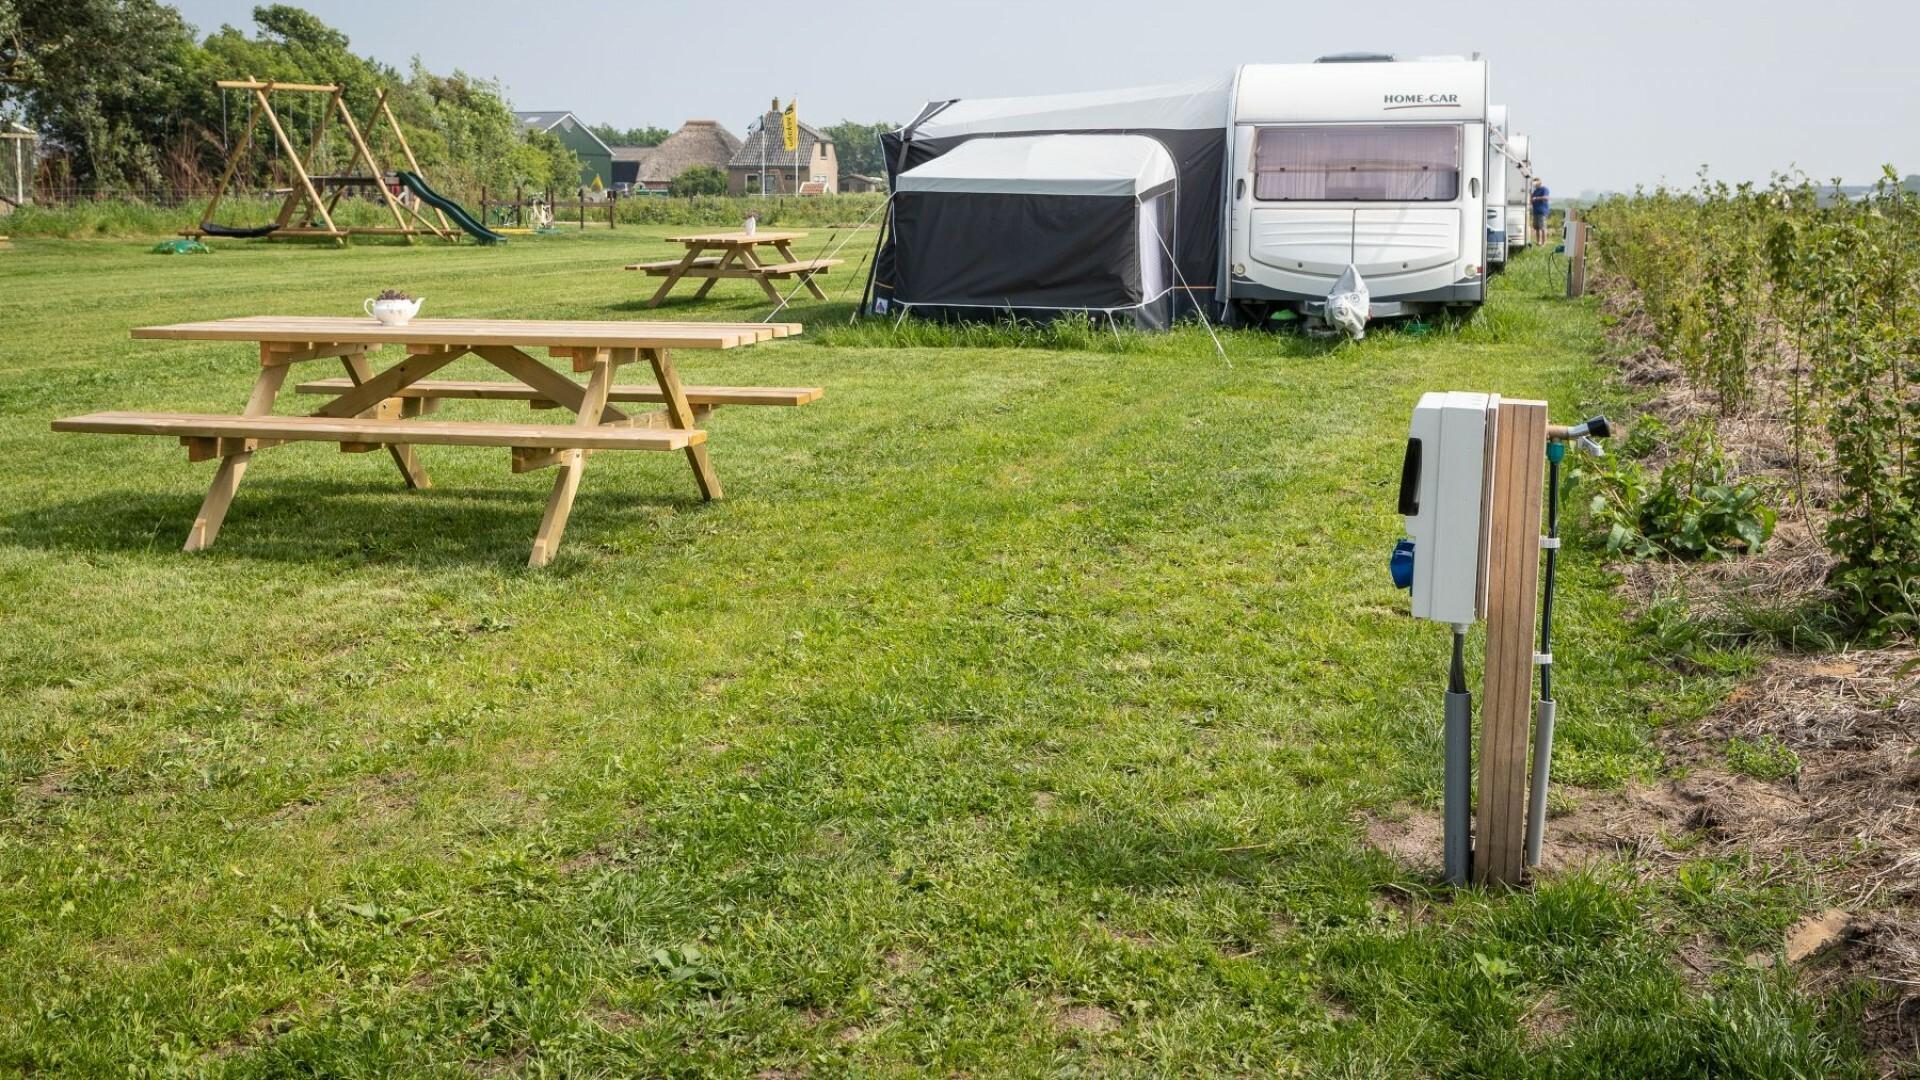 De Tesselsekamping boerencamping caravanplaats VVV Texel